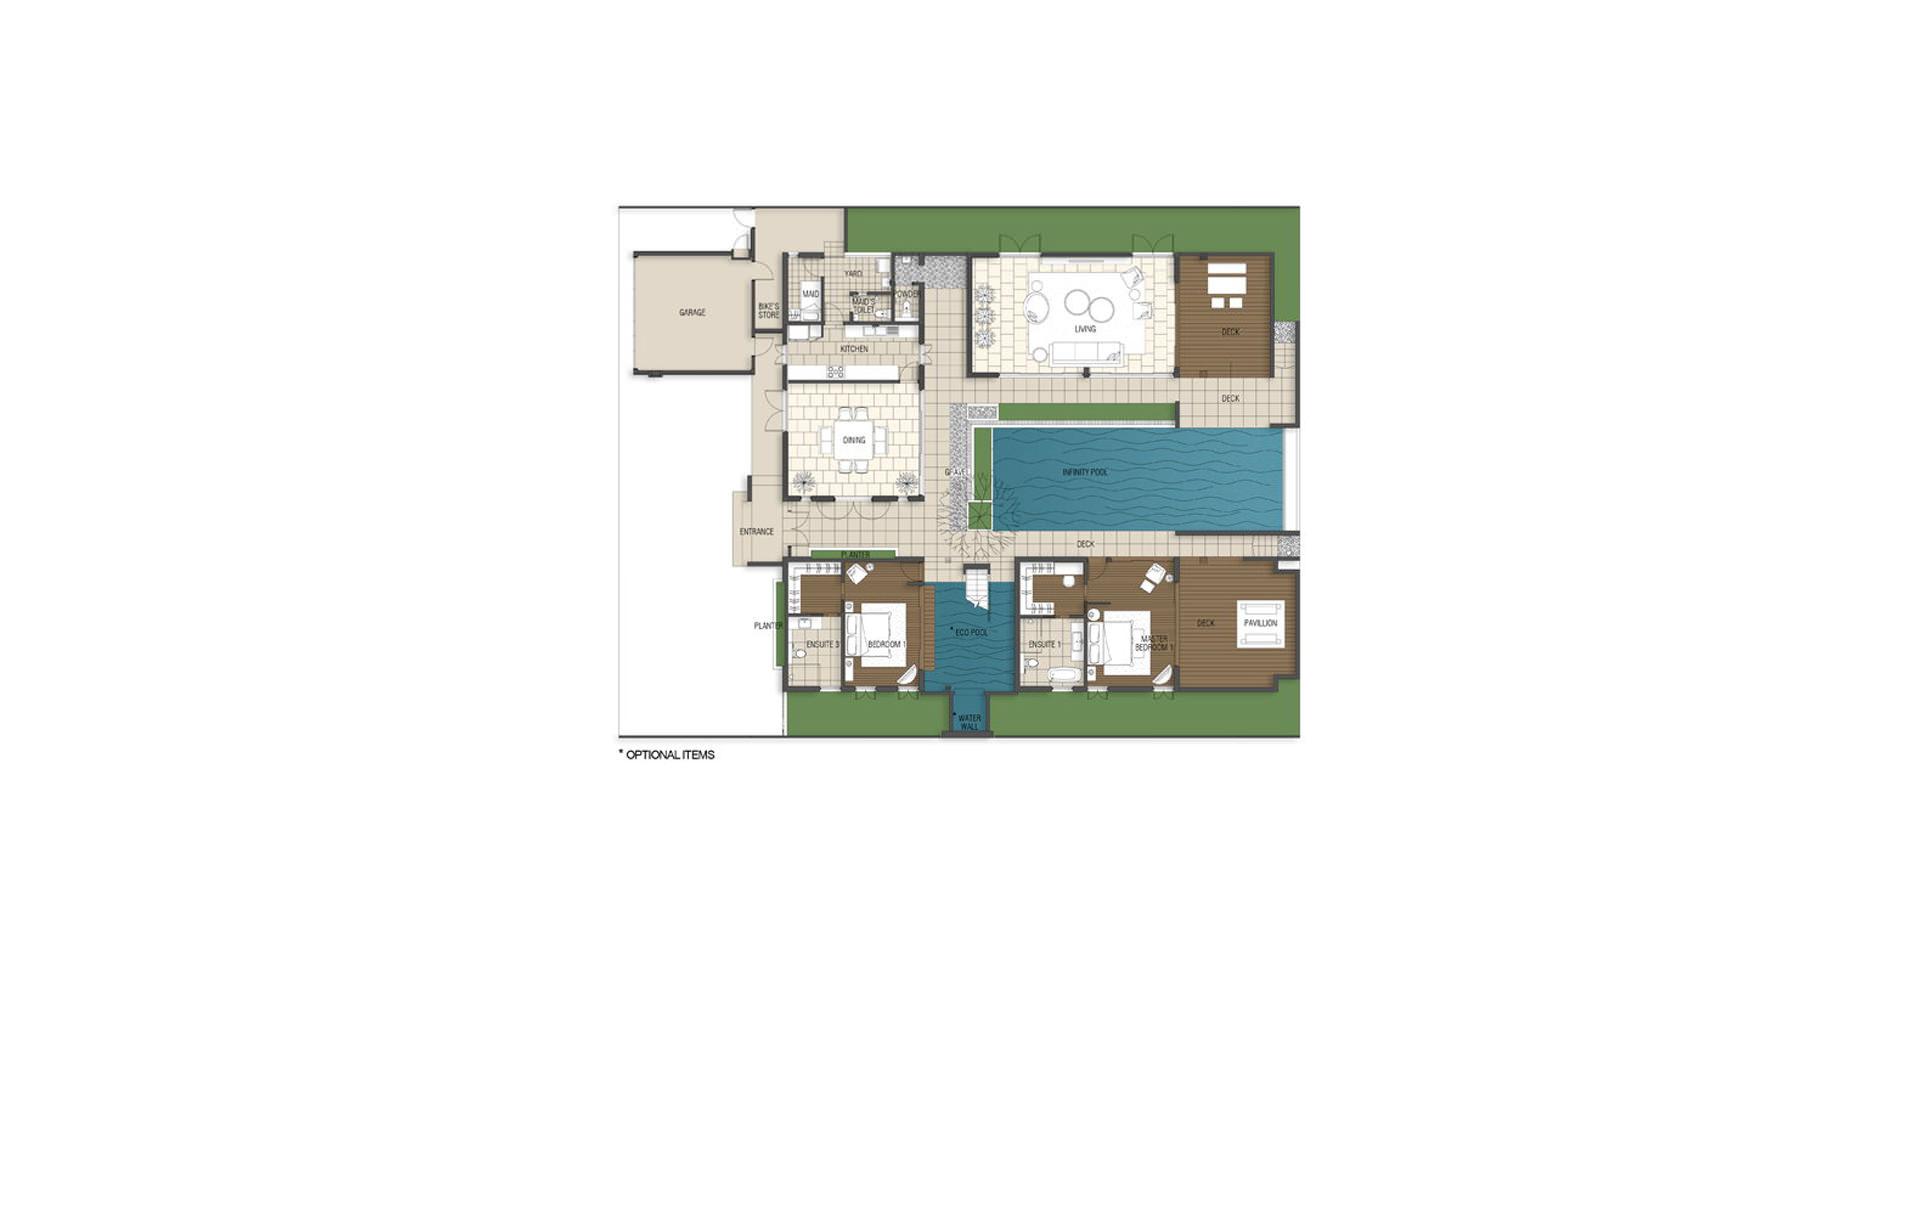 4 Bedroom Villa – Pavilion 1st Storey